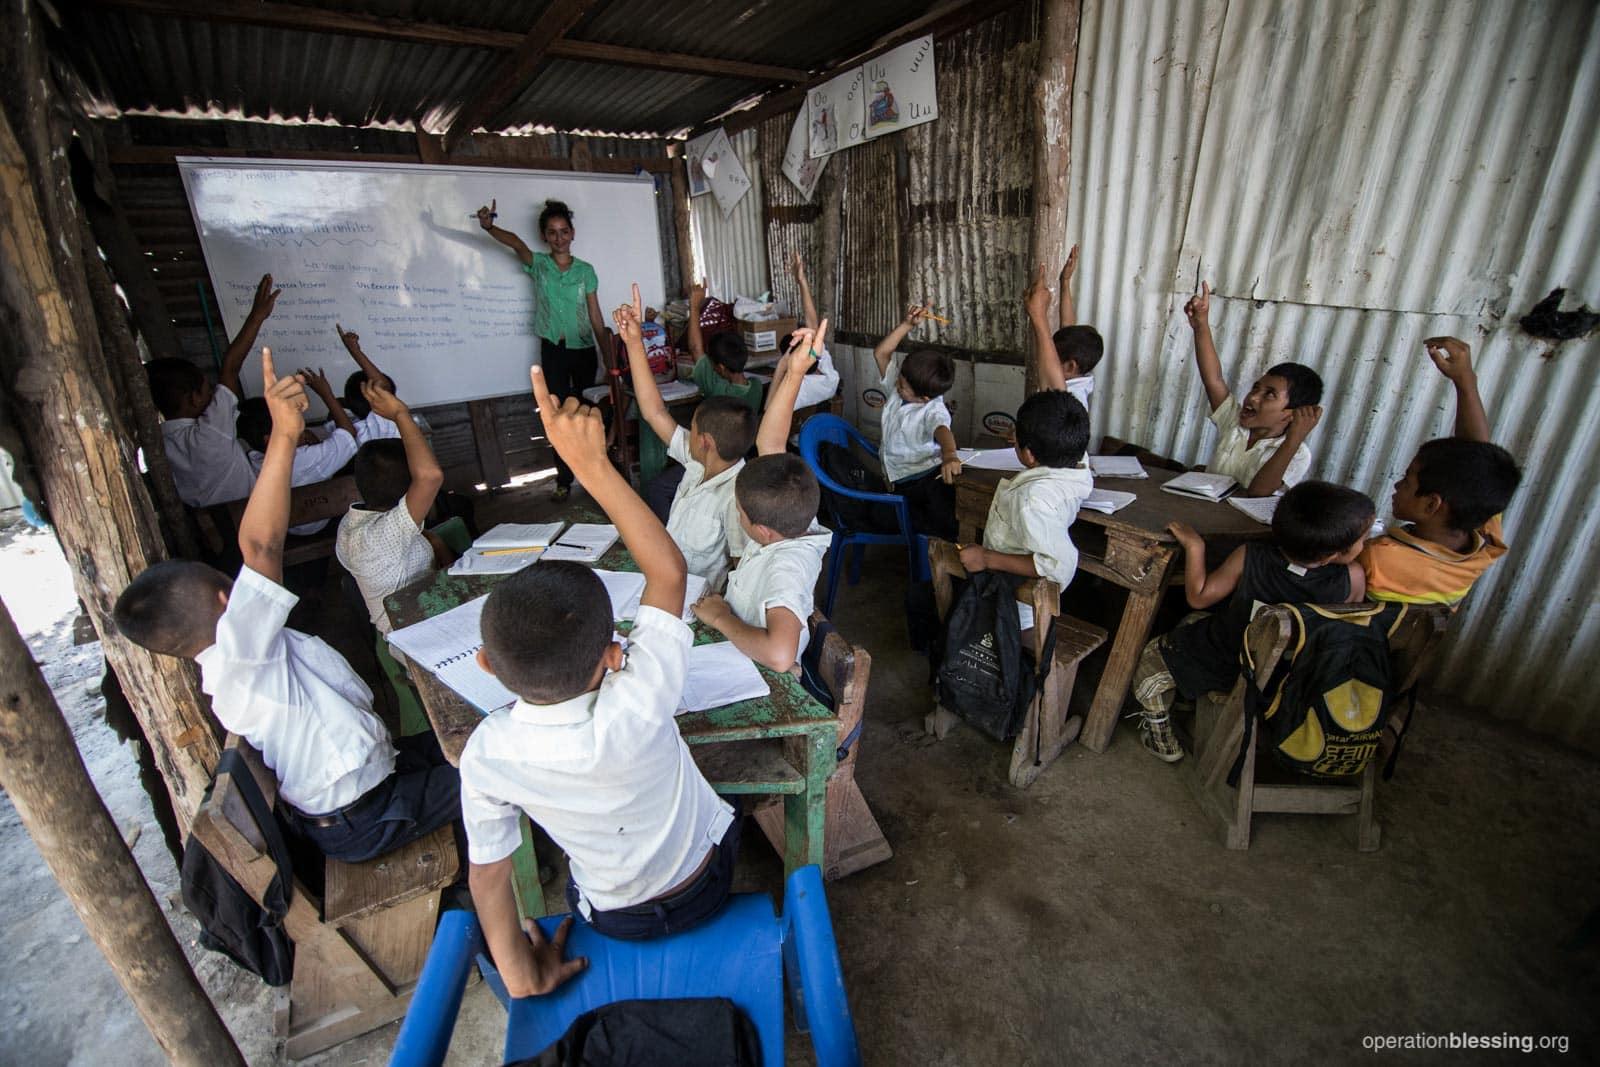 Children in this makeshift Honduran classroom endured intense heat, insects, and rain leaks.